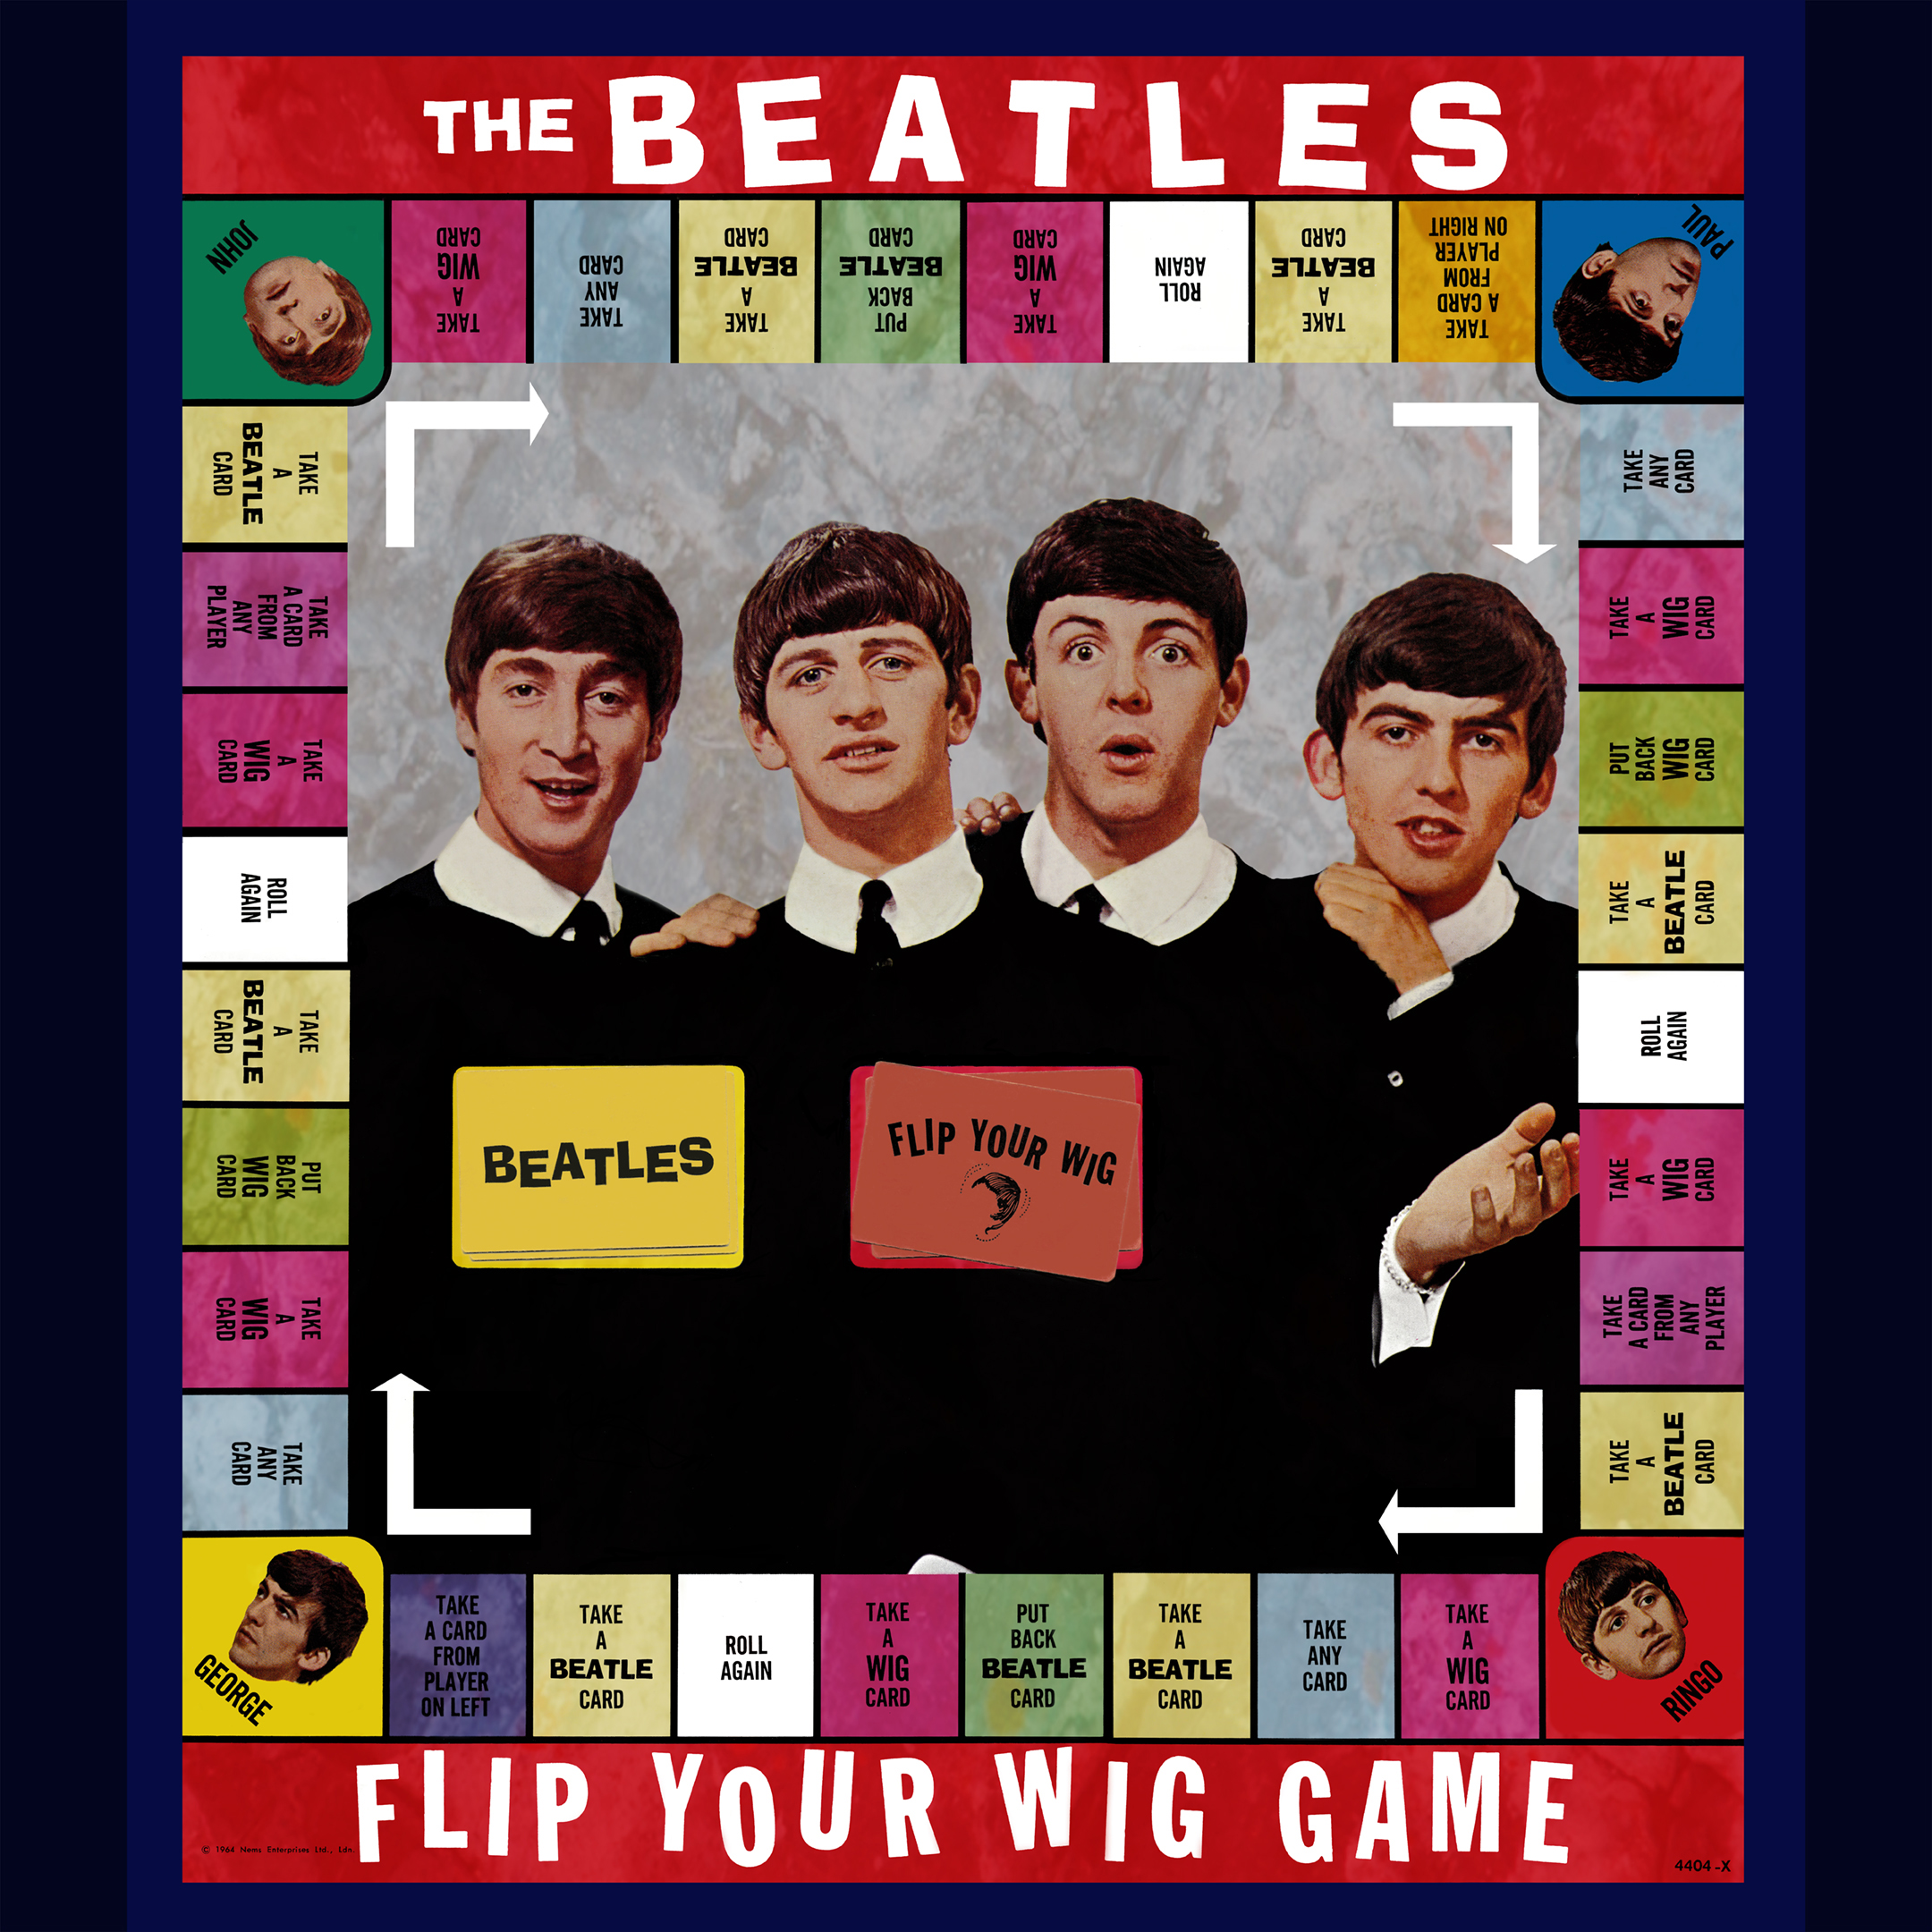 Beatles Flip Yout Wig Game Panorama1